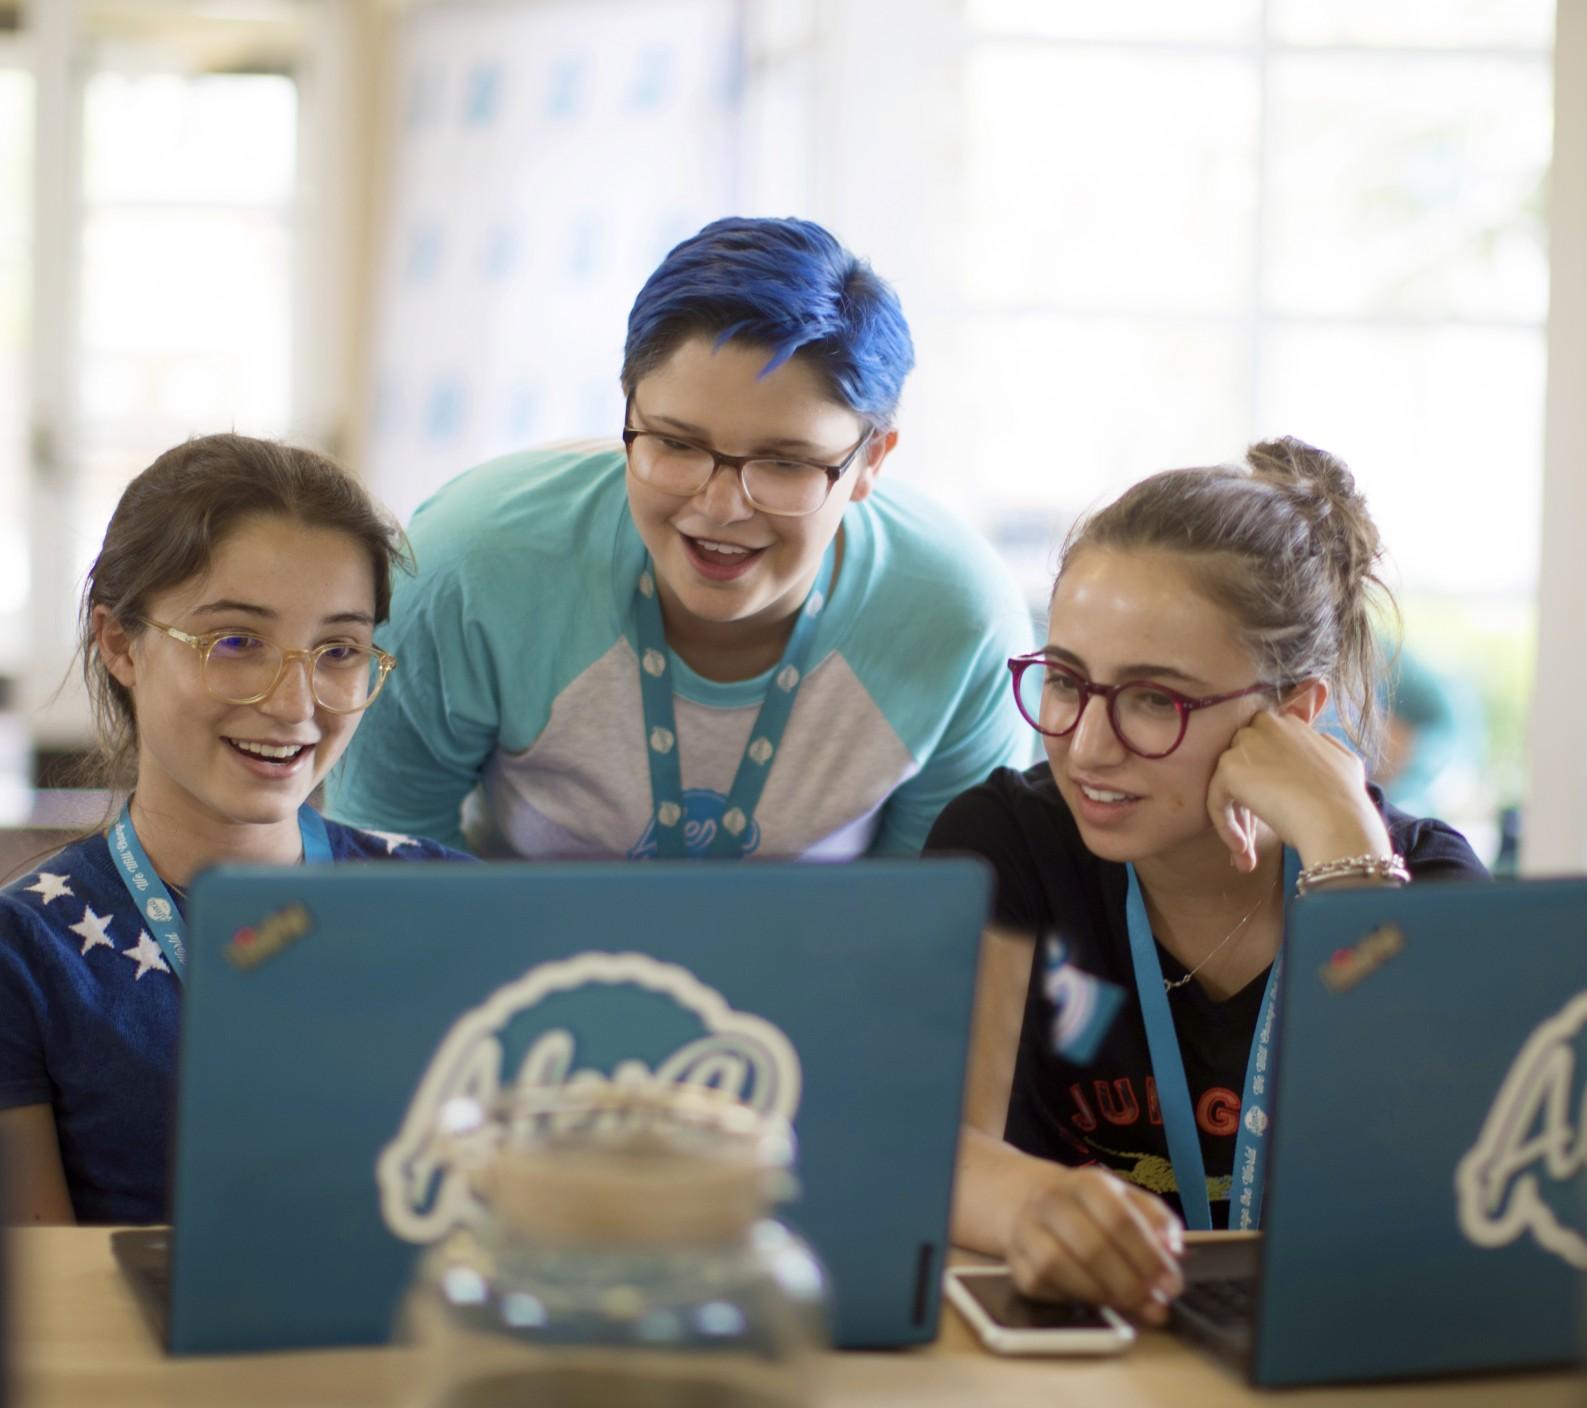 Summer Program - Electronics | Alexa Cafe: All-Girls STEM Camp | Held at Bryn Mawr